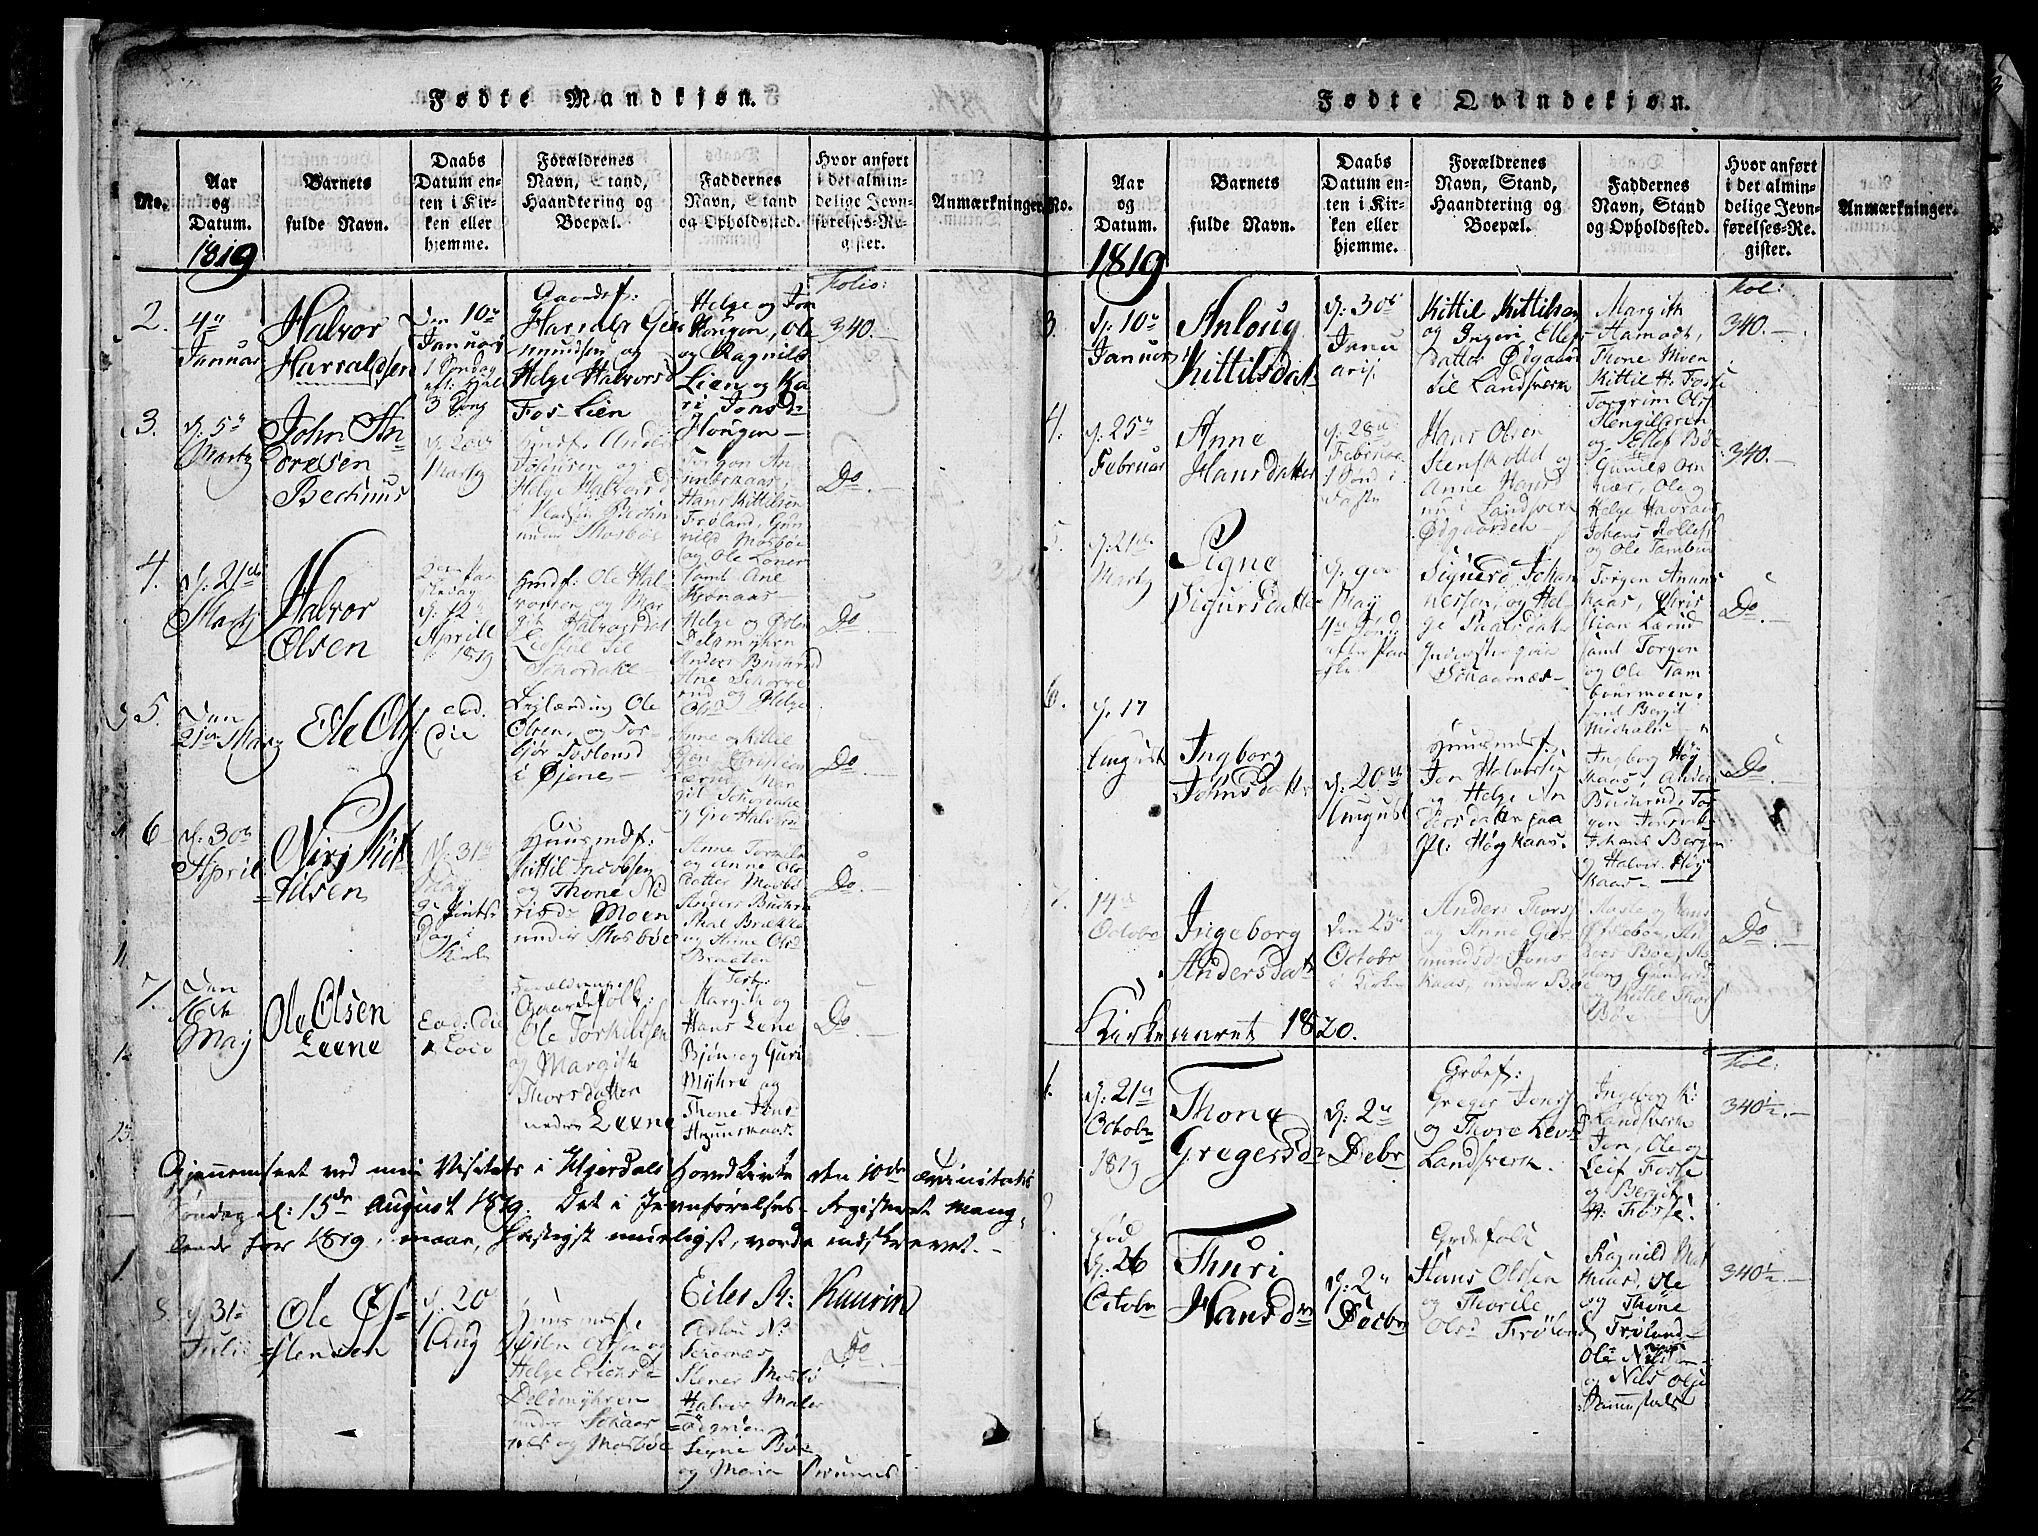 SAKO, Hjartdal kirkebøker, F/Fb/L0001: Ministerialbok nr. II 1, 1815-1843, s. 9